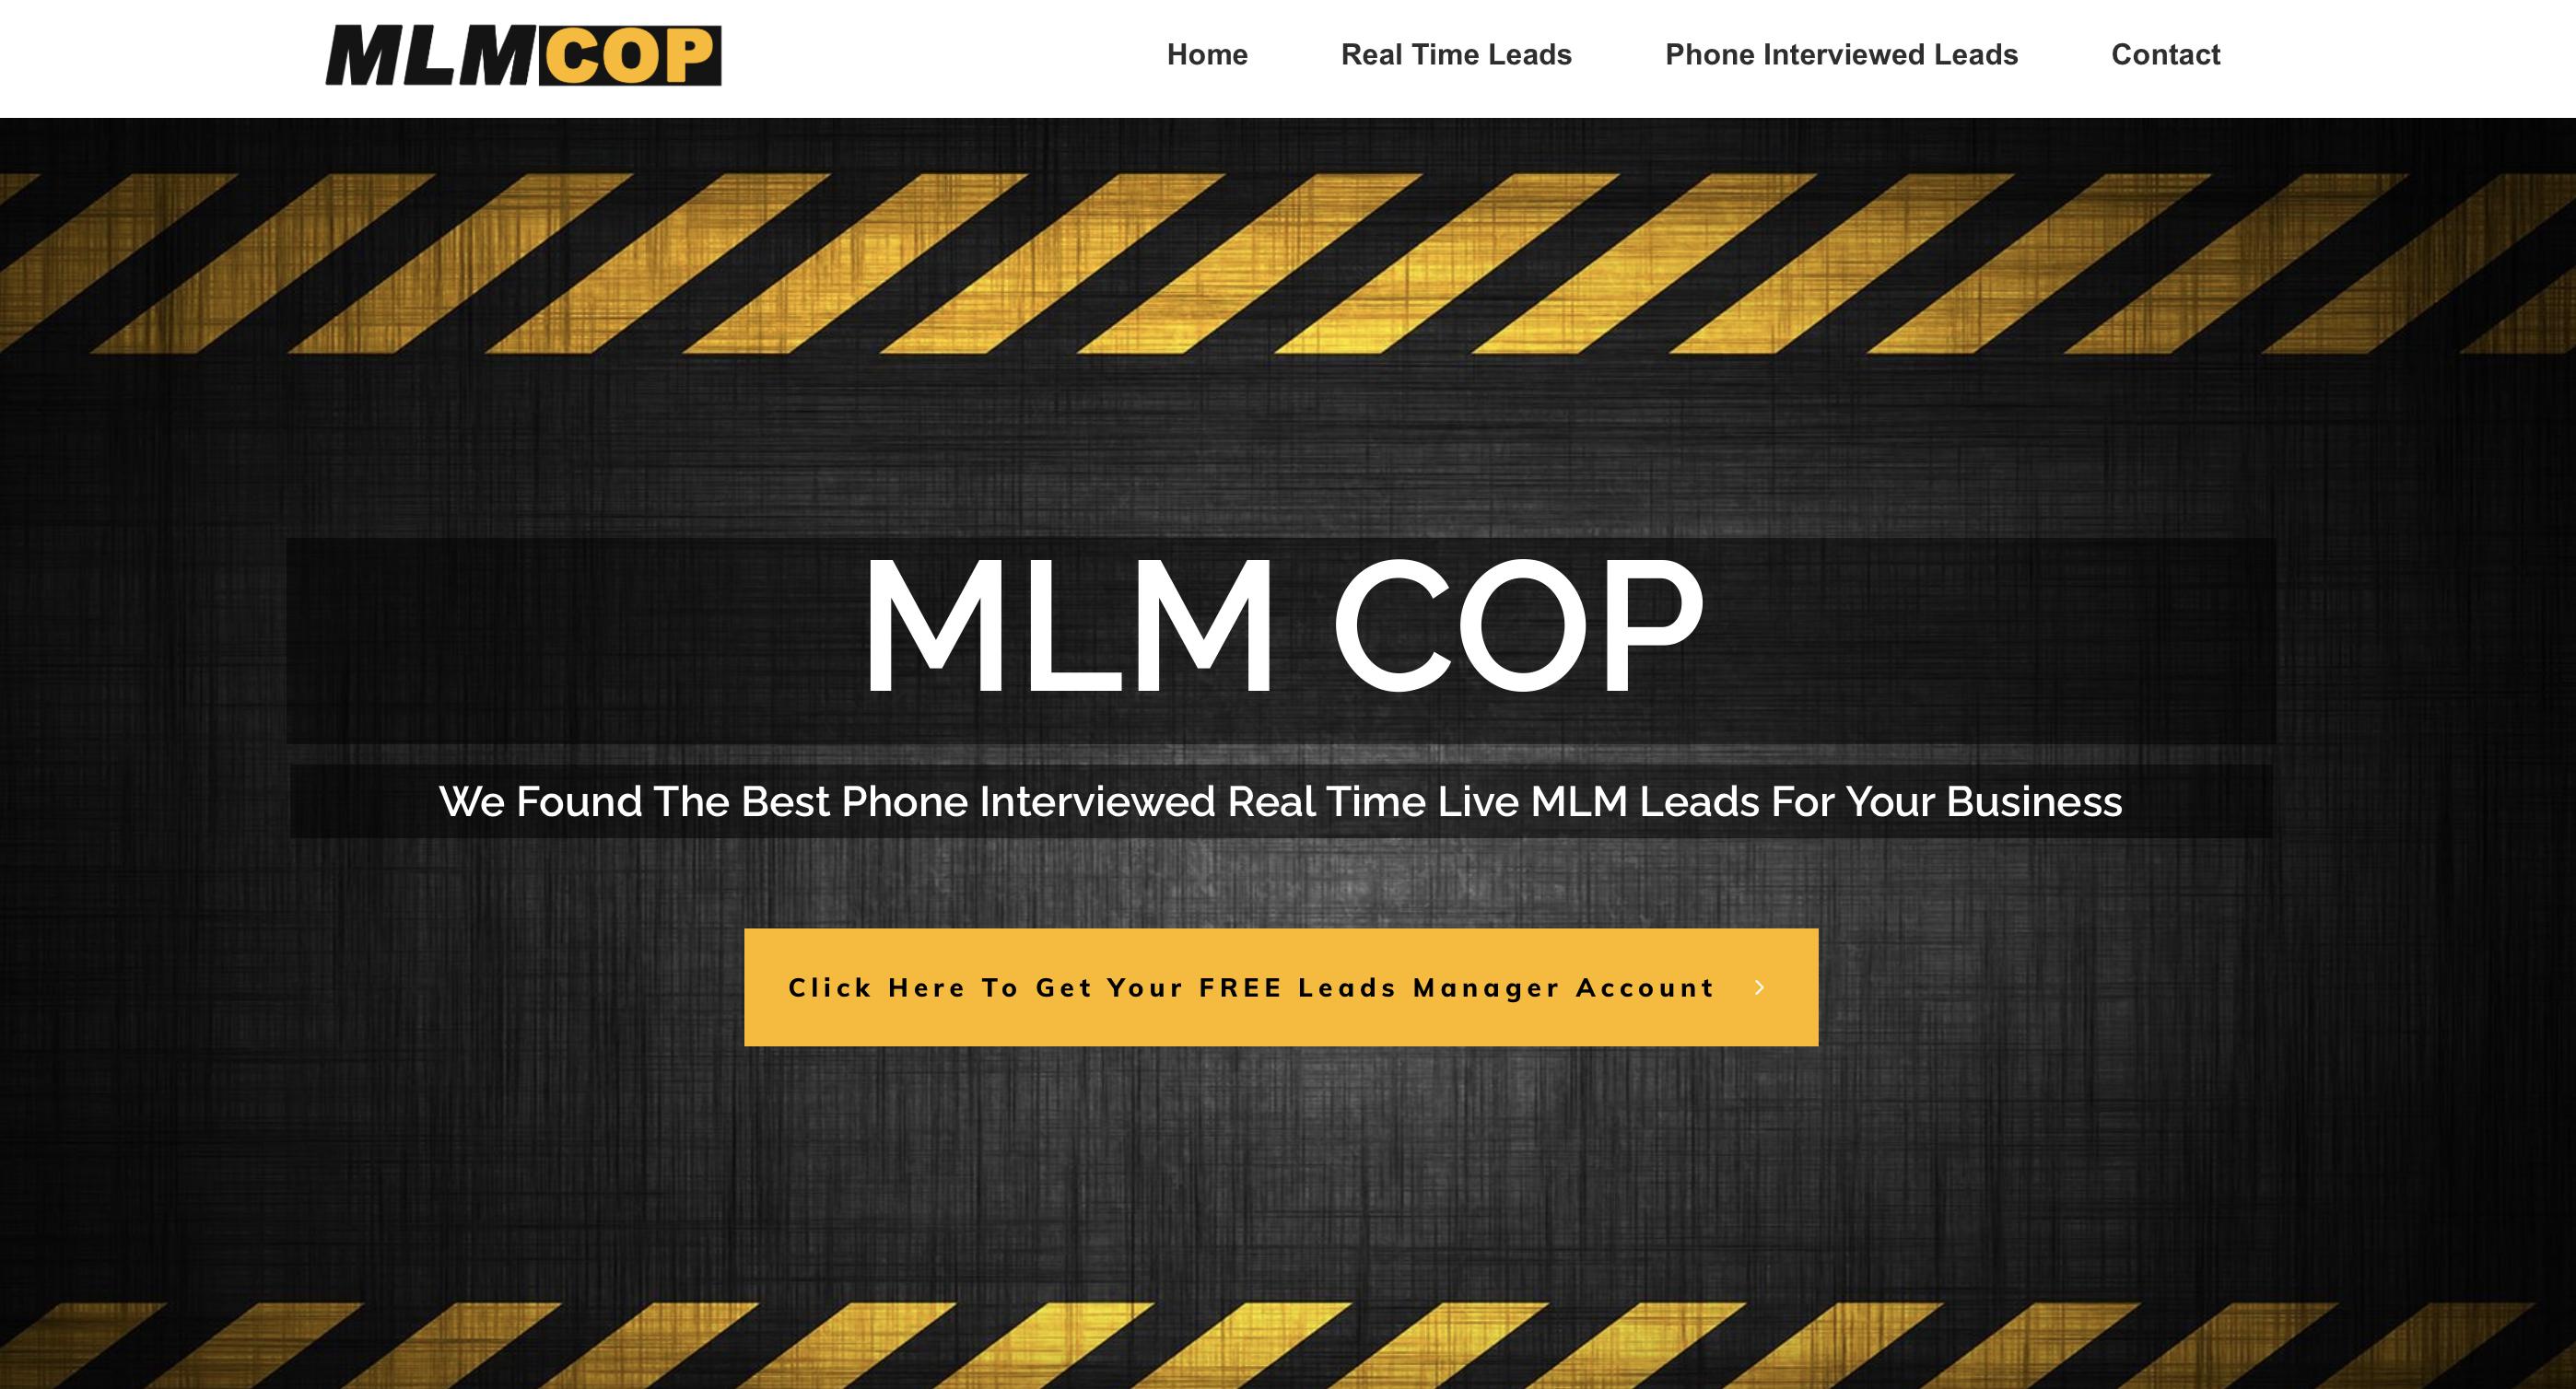 MLMcop.com